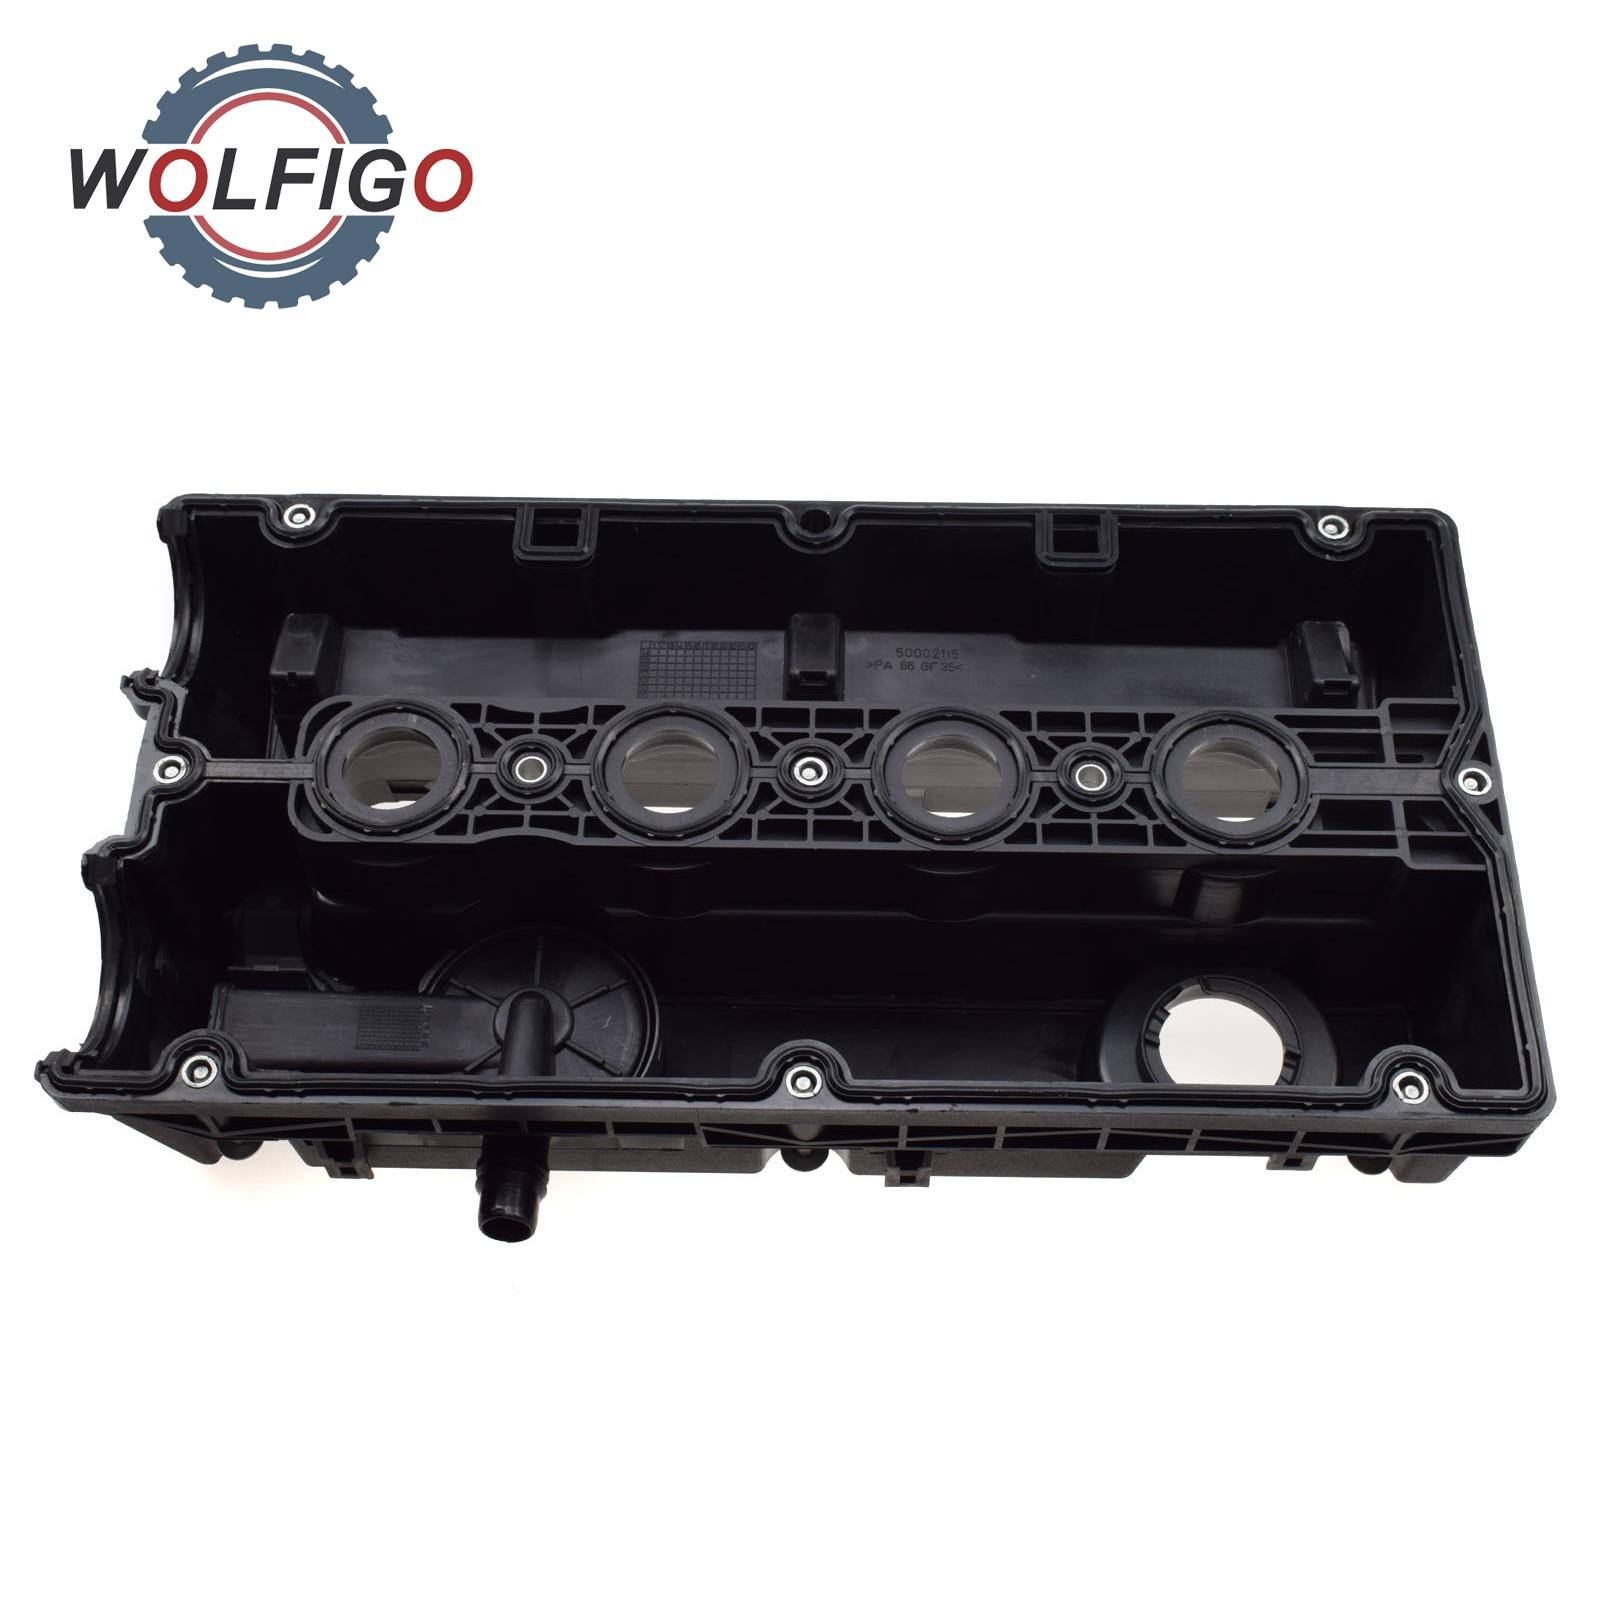 wolfigo cam rocker engine valve cover z16xep 1 6l 55556284 5607159 for vauxhall astra g mk4 [ 1600 x 1600 Pixel ]